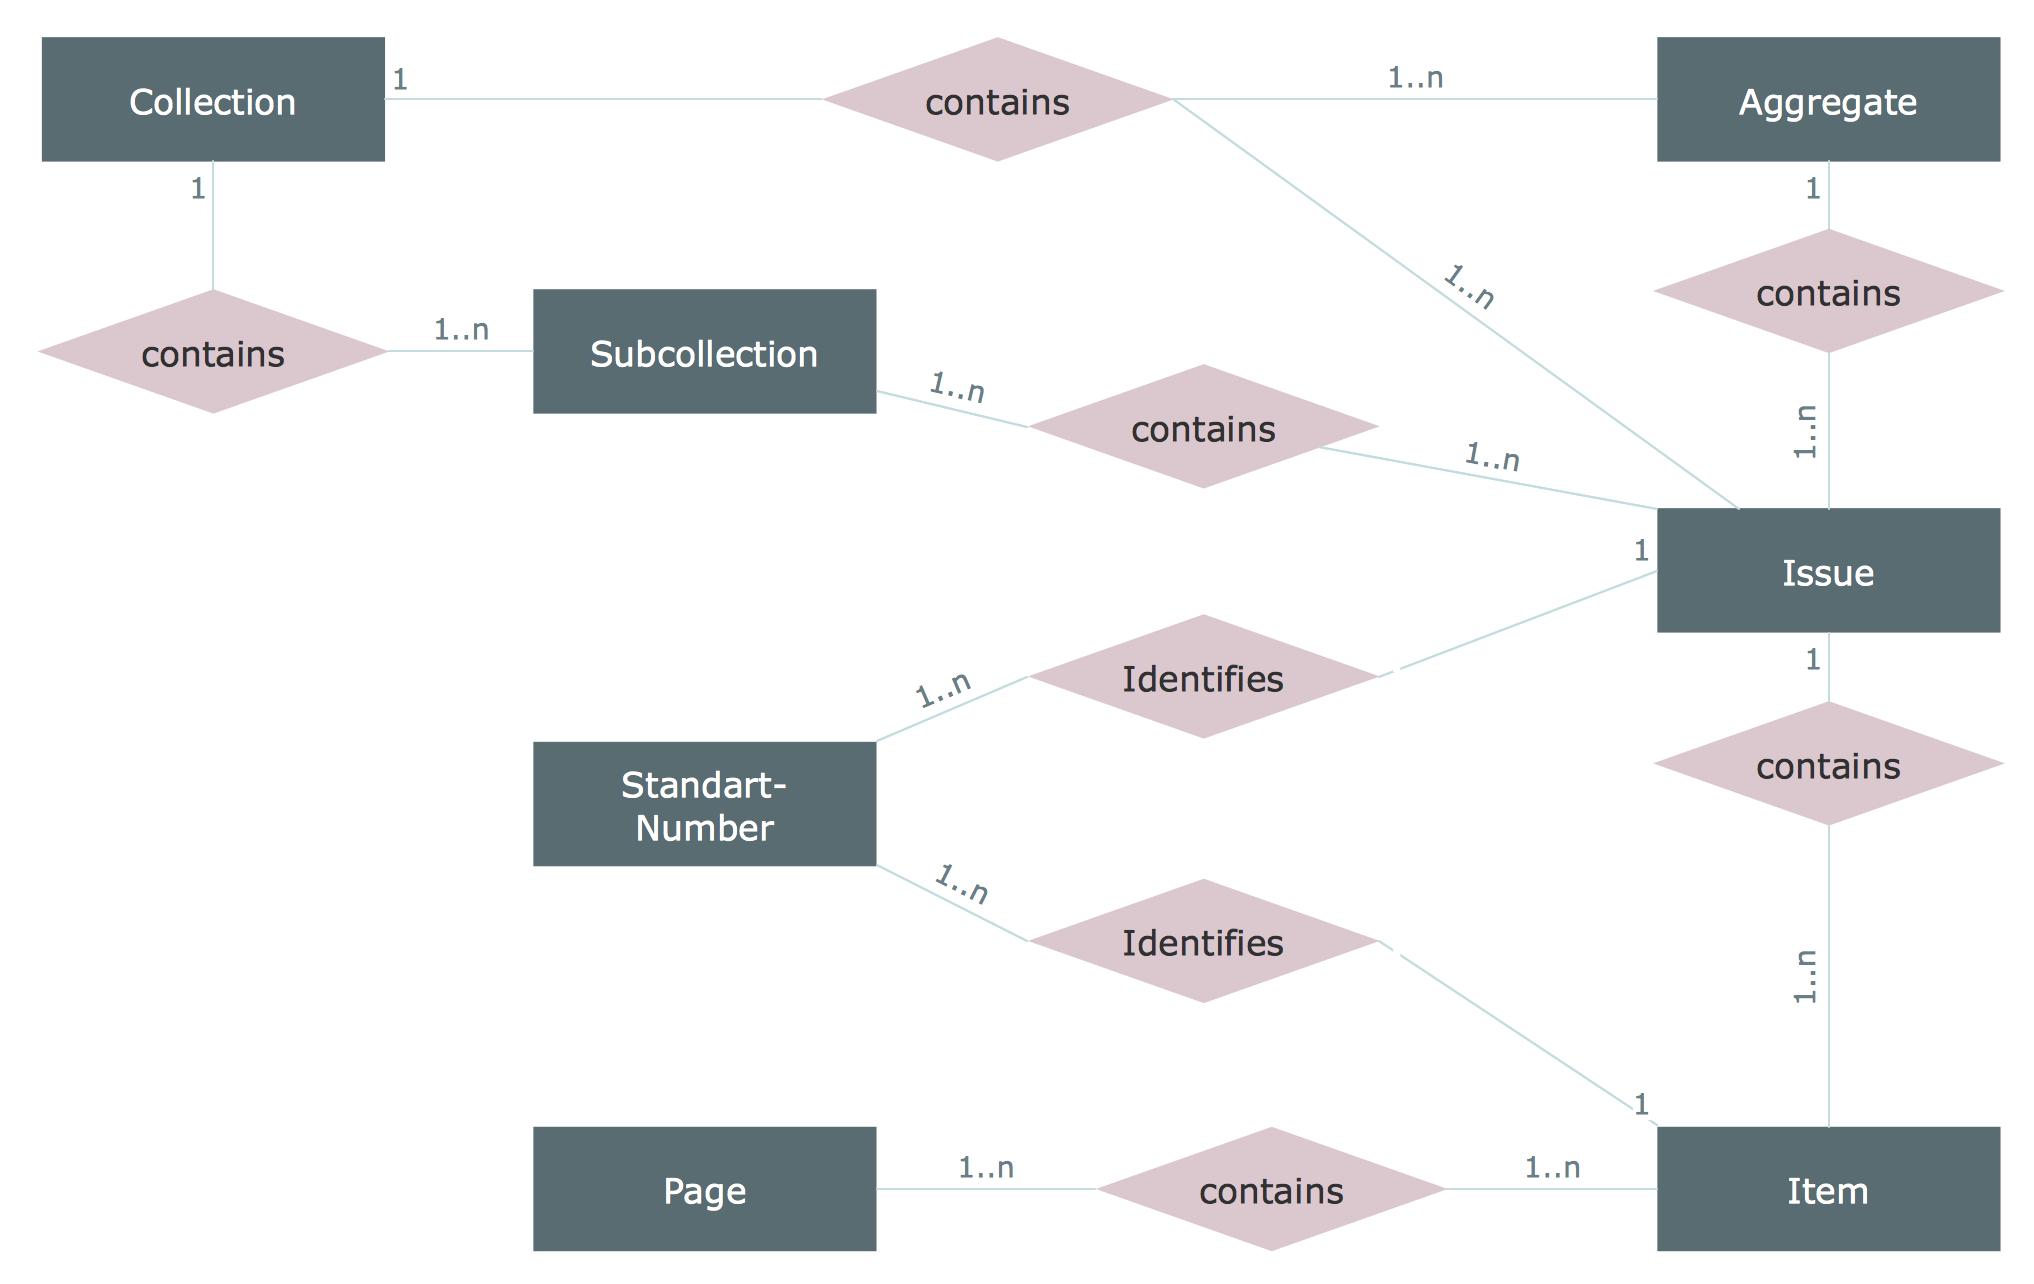 Entity Relationship Diagram (Erd) Solution | Conceptdraw regarding Entity Relationship Diagram Erd